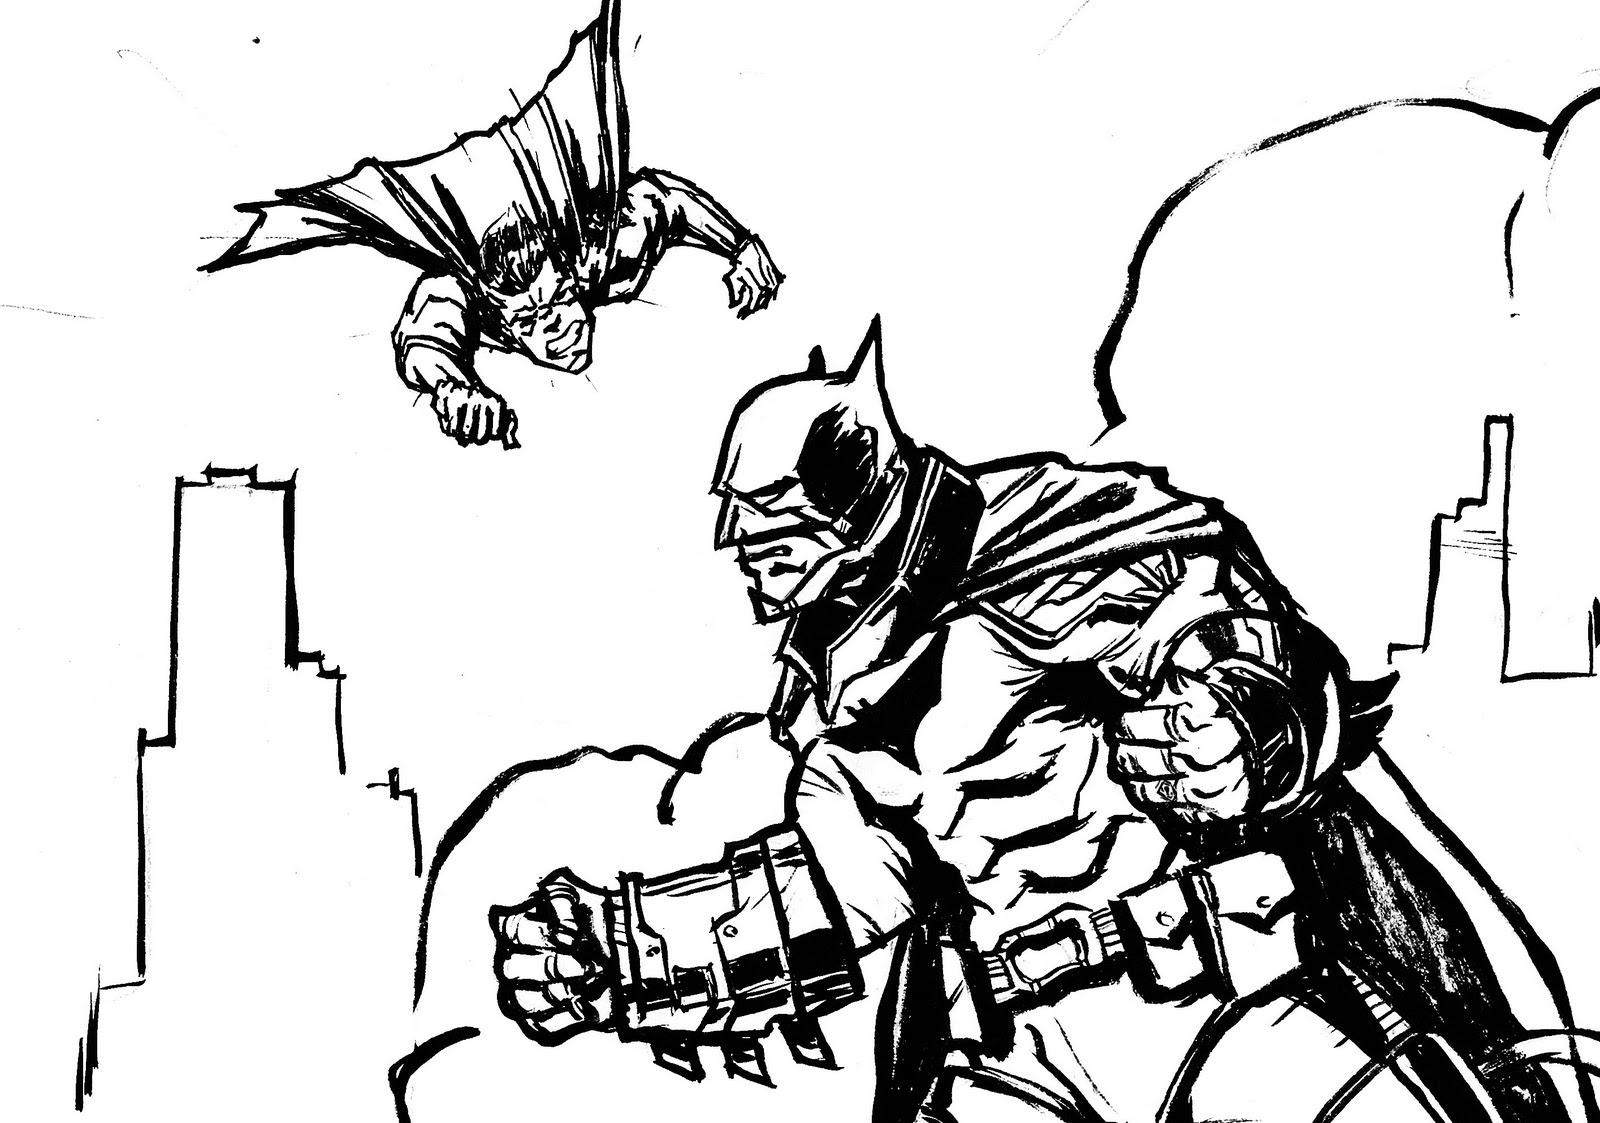 Search for Batman drawing at GetDrawings.com